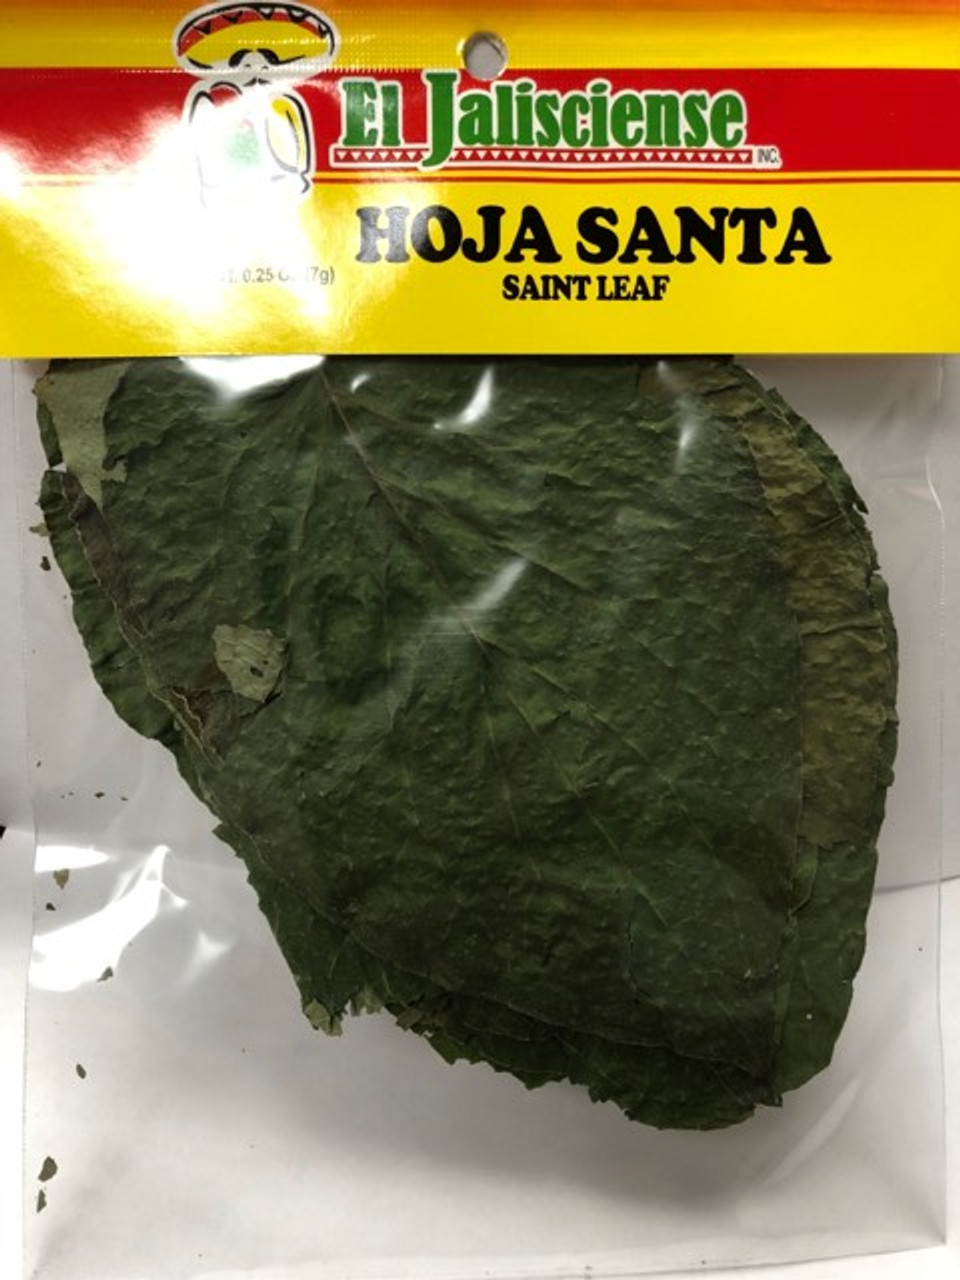 El Jalisciense Hoja Santa Single Bag